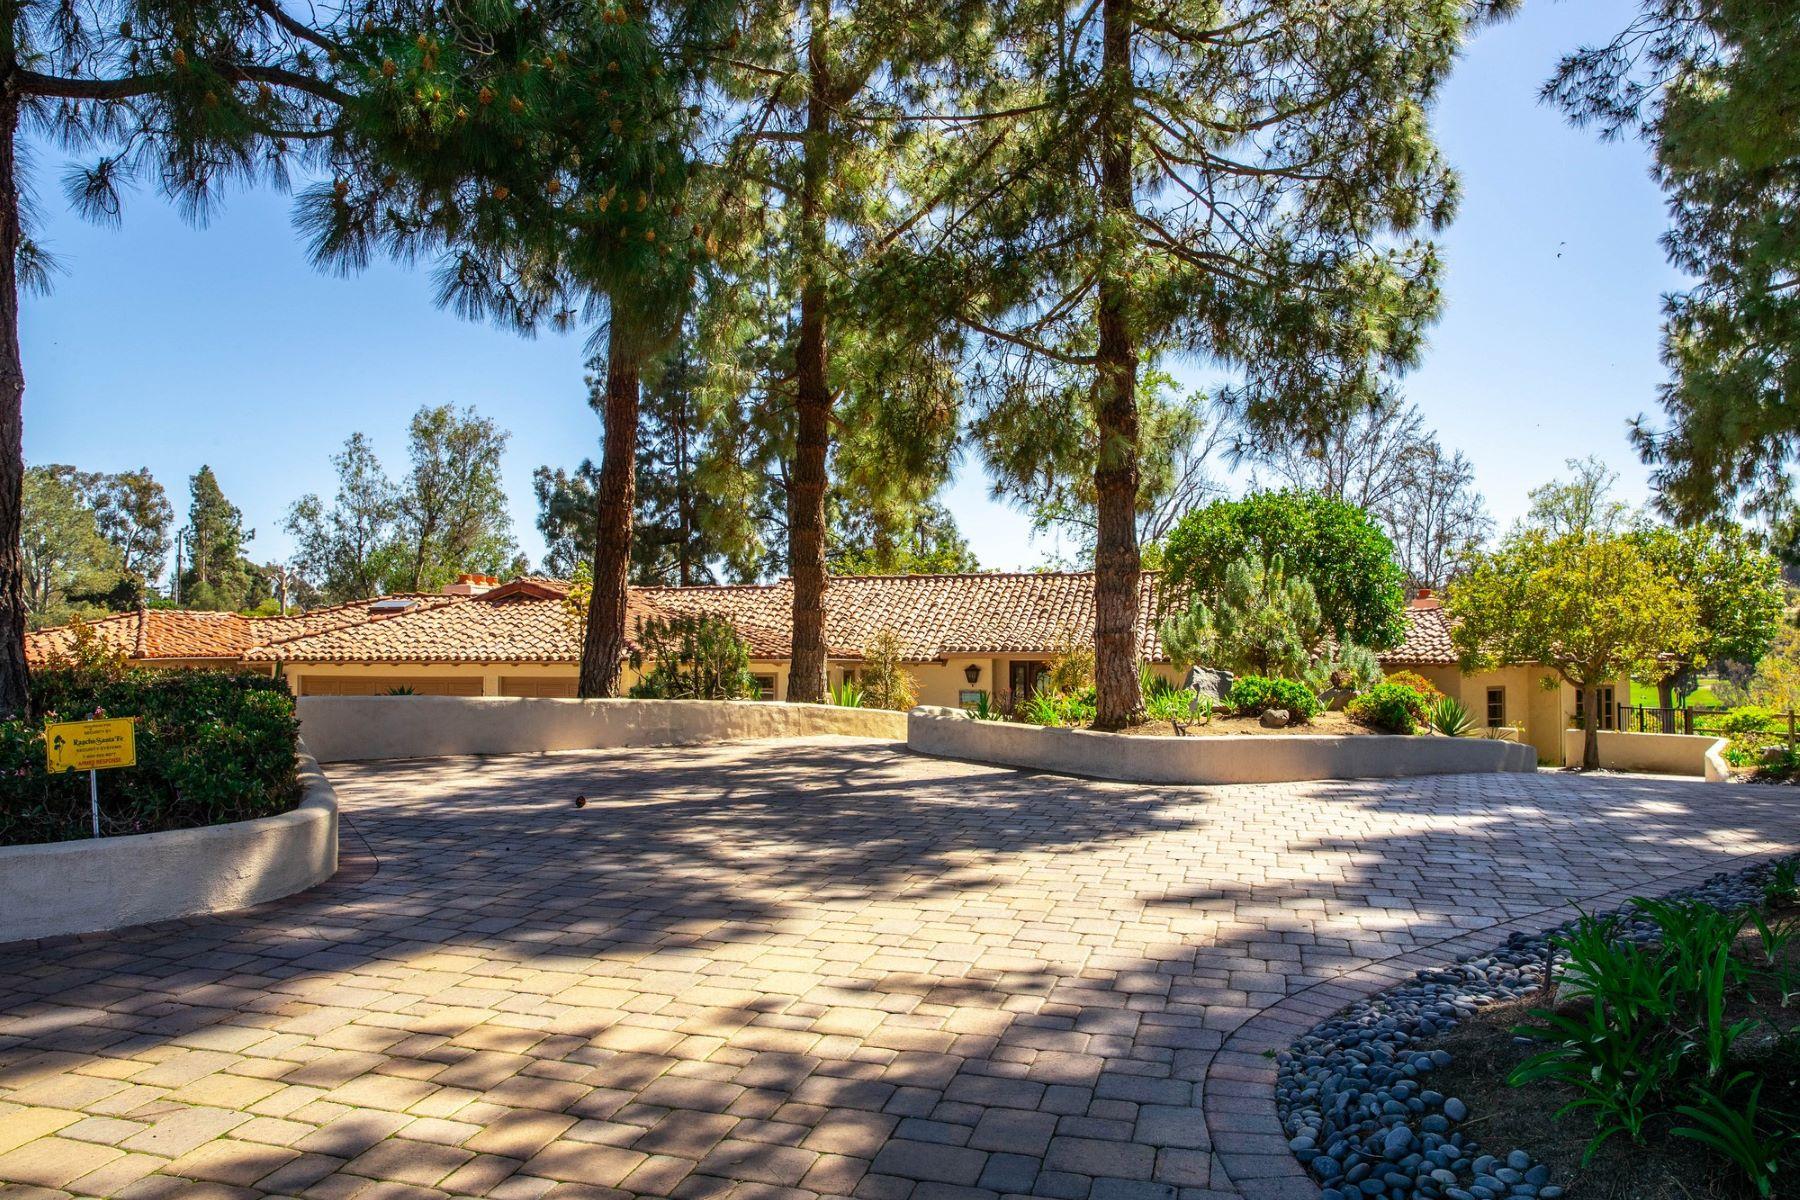 Property for Sale at 5557 San Elijo Rancho Santa Fe, California 92067 United States